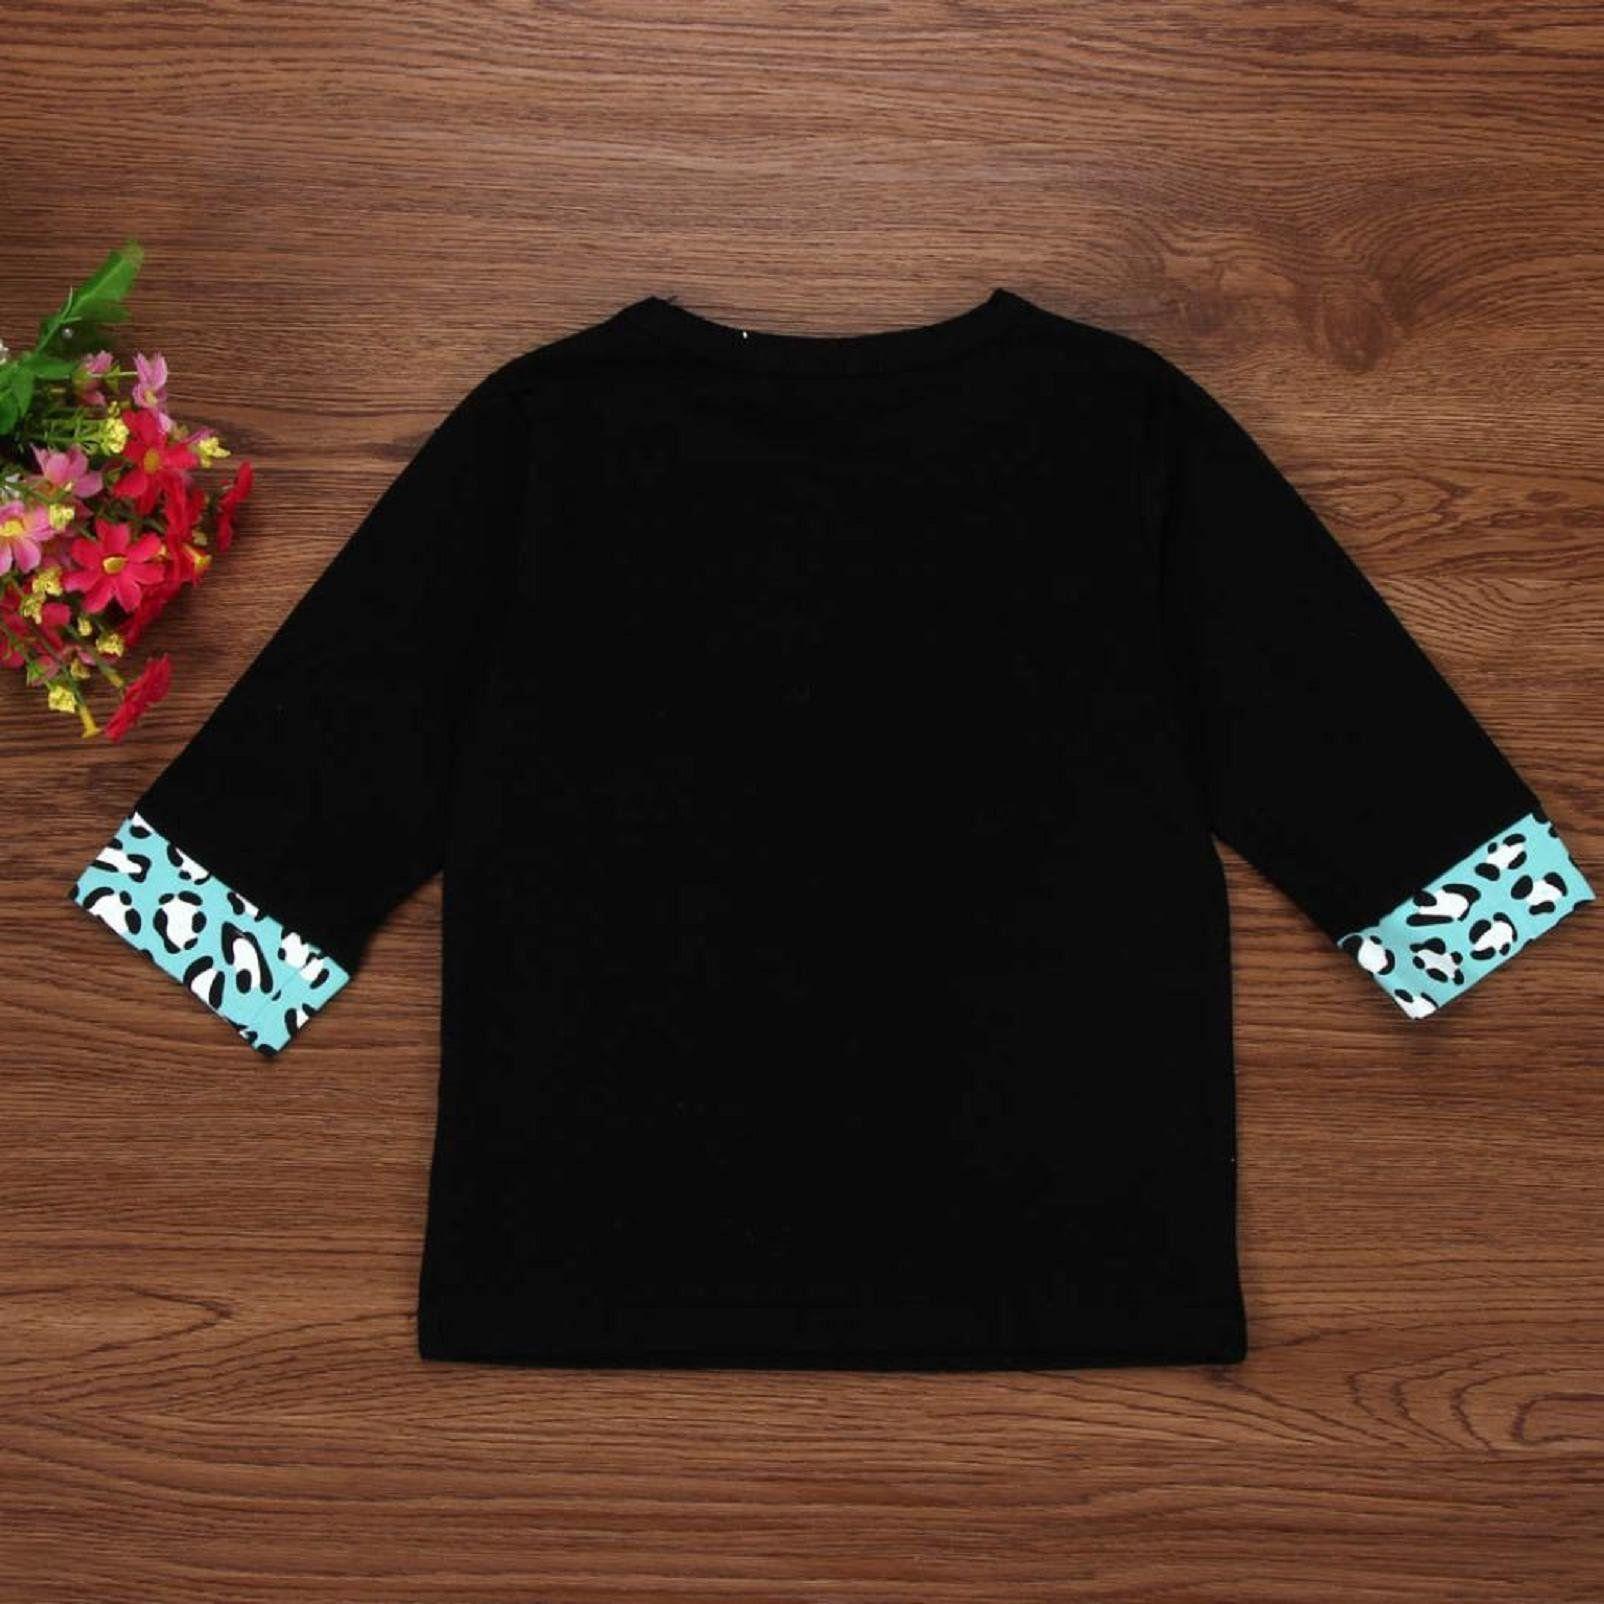 8514156e6 Baby Clothes Set PPBUY Girls Tshirt Tops Long Pants 2PCS Outfits Set ...